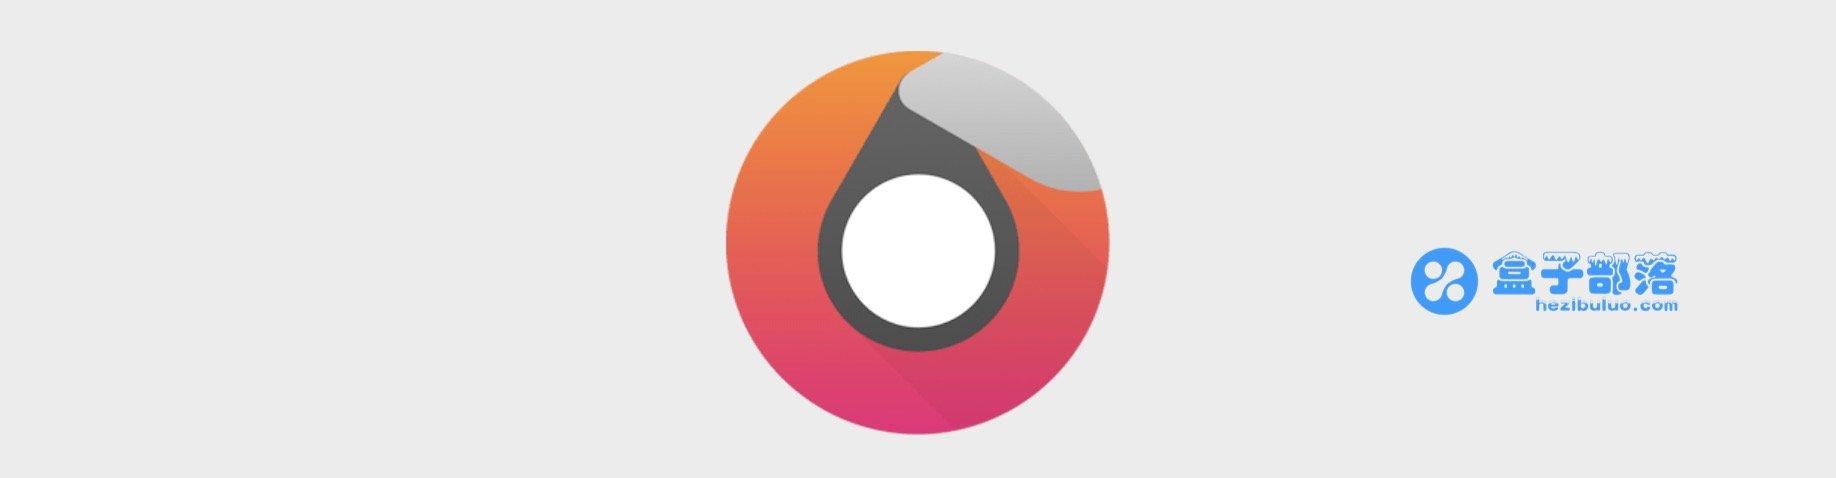 Videoloupe v1.2.1 一款免费的媒体播放器与专业视频编辑套件